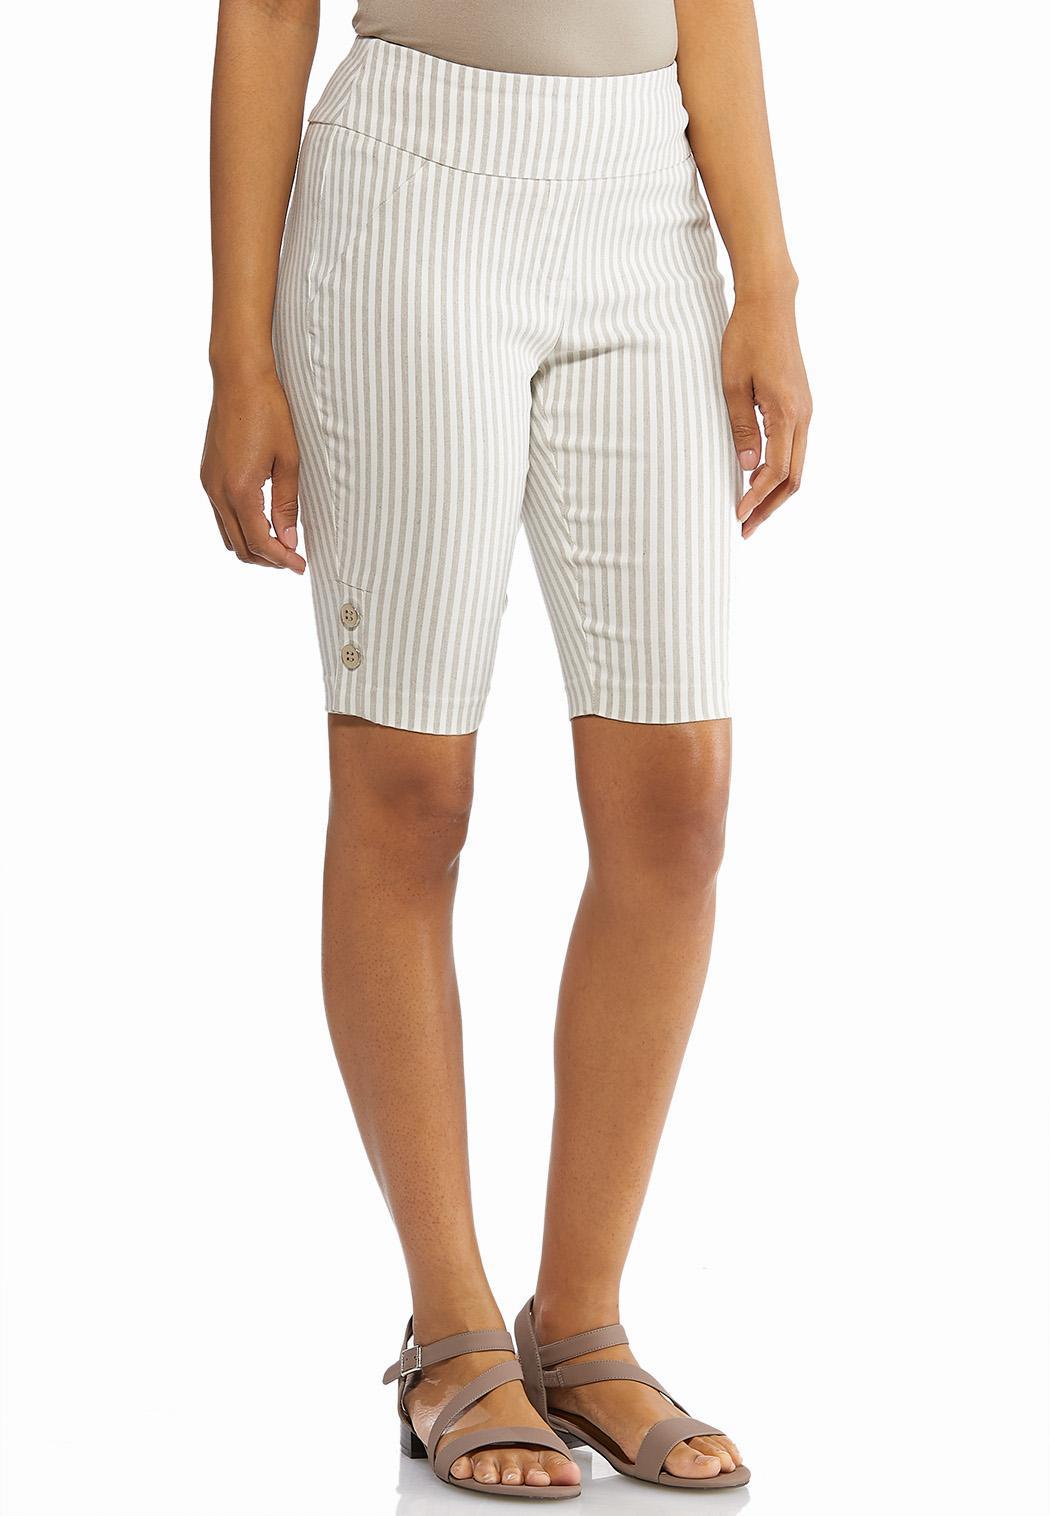 e4bf23bda0c Striped Bermuda Shorts alternate view · Striped Bermuda Shorts